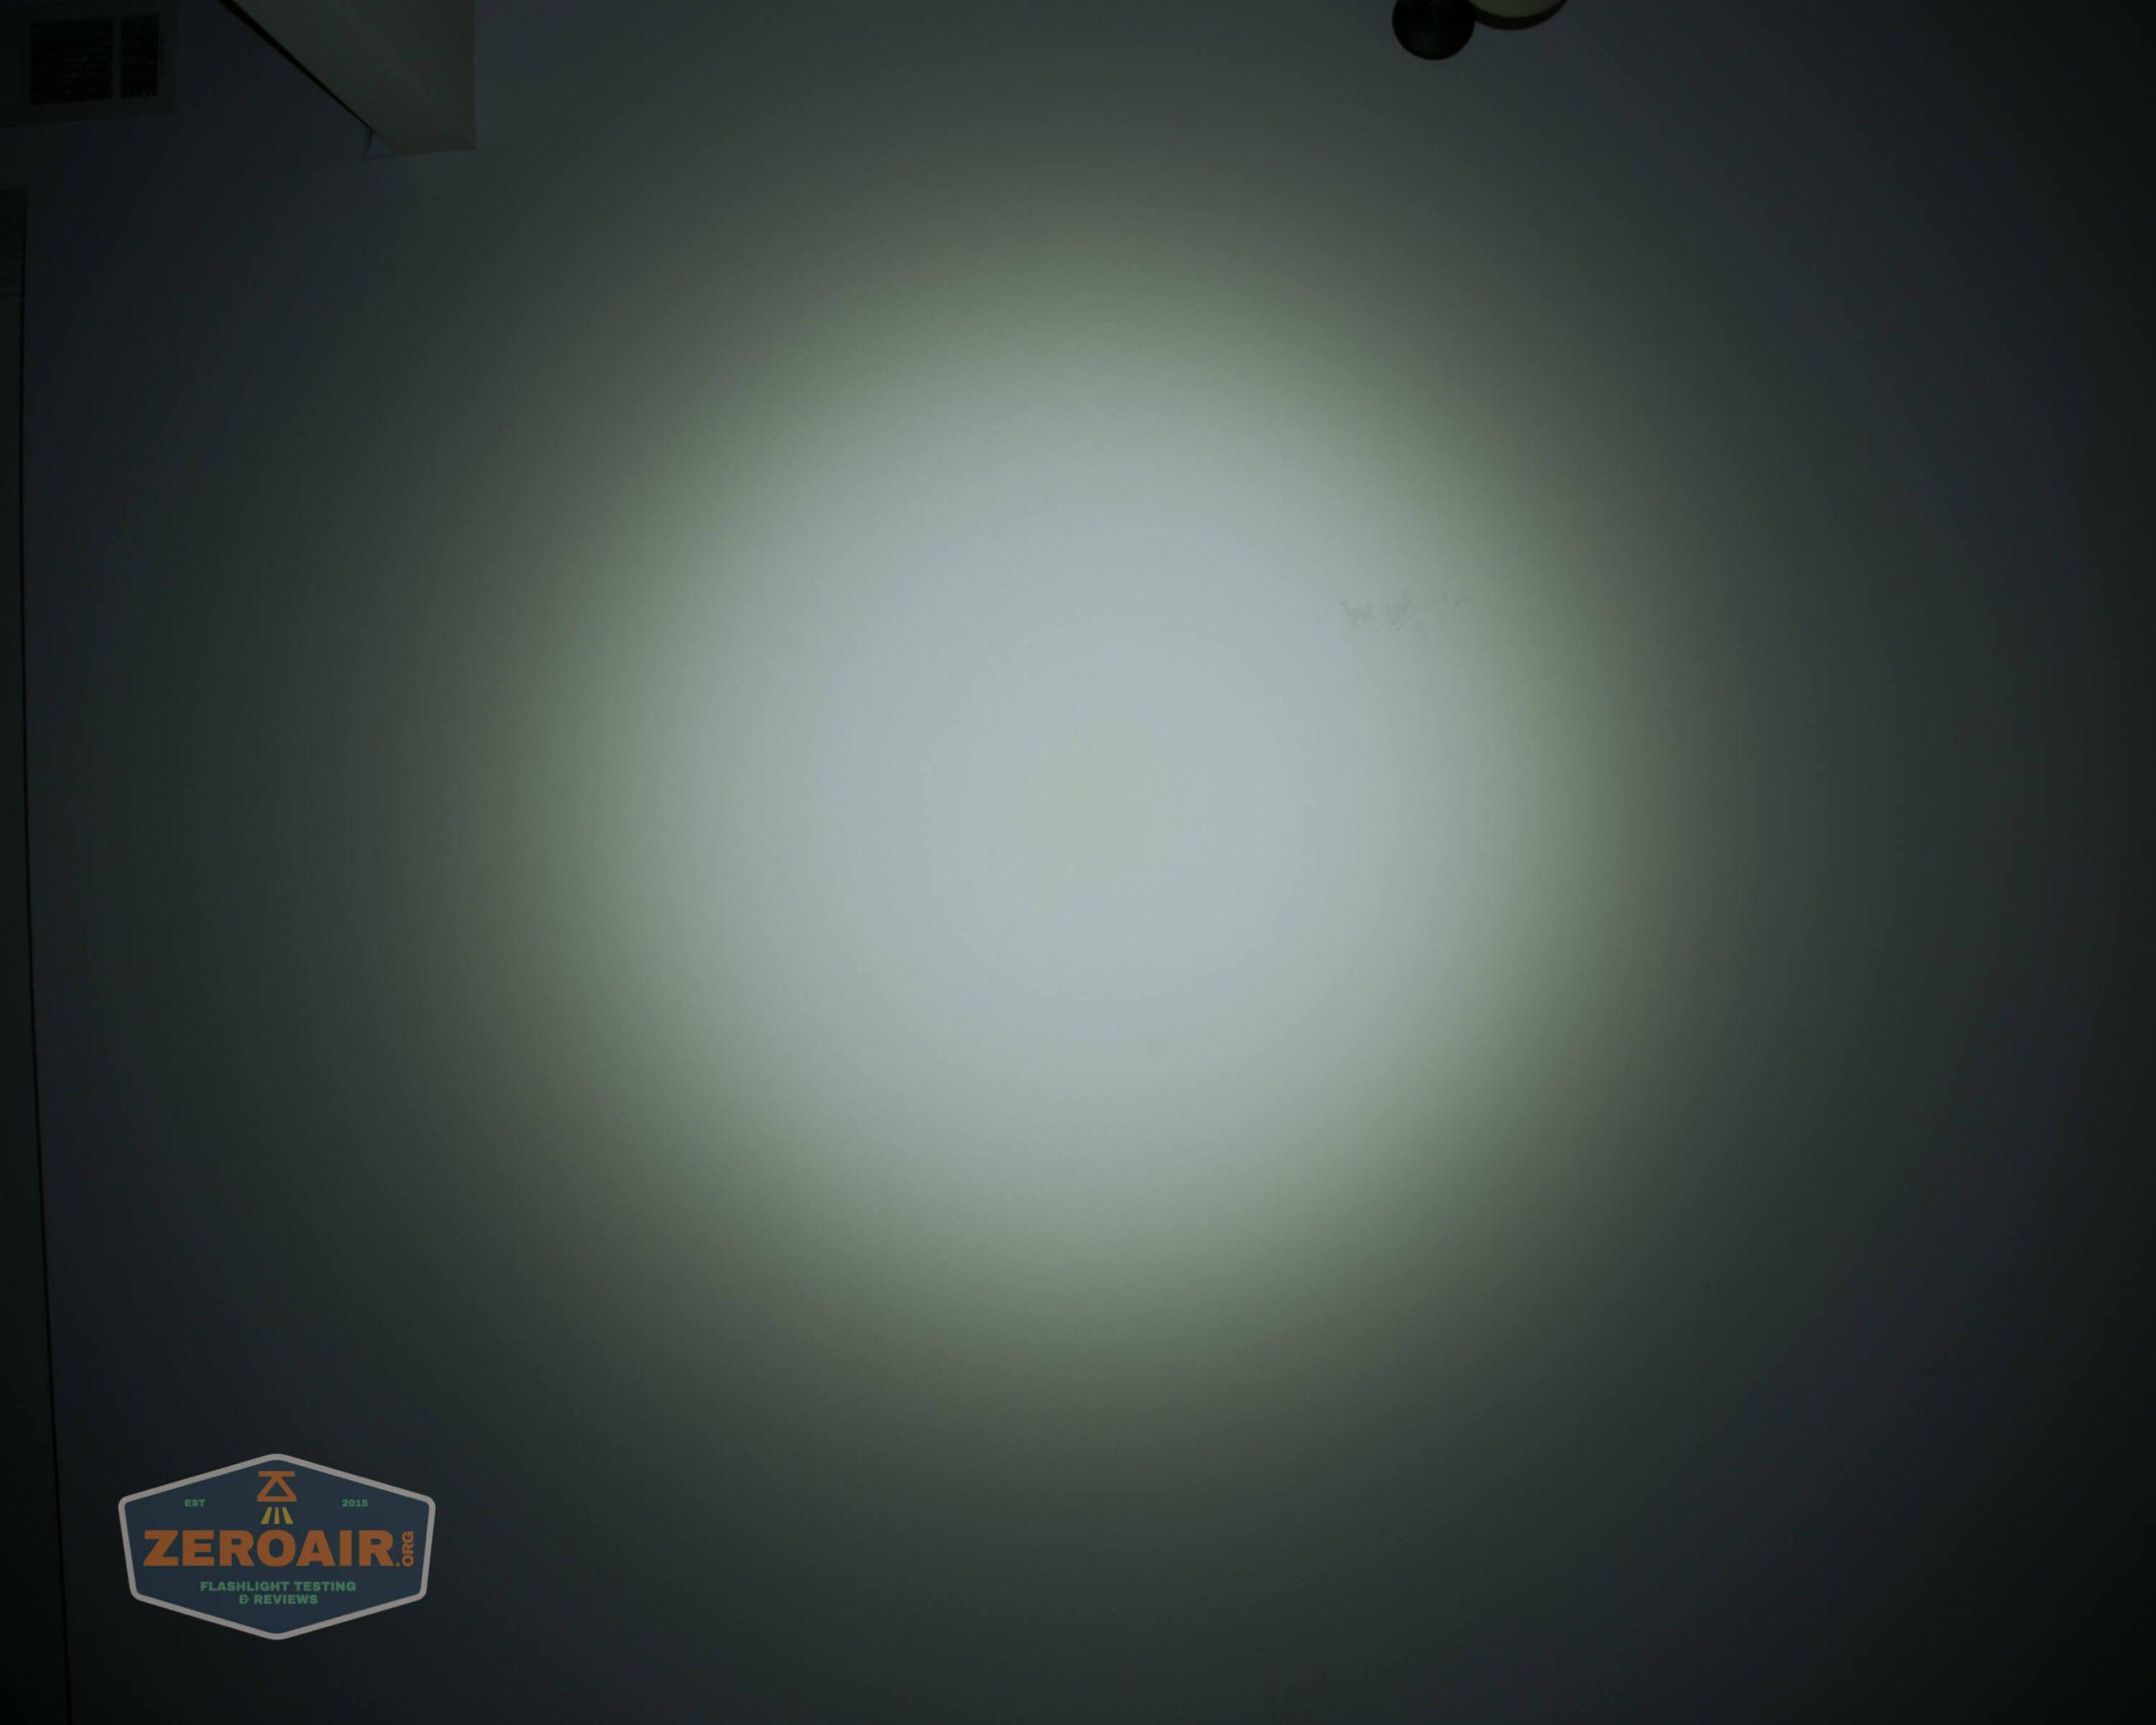 klarus g25 21700 cree xhp70.2 flashlight beamshot ceiling